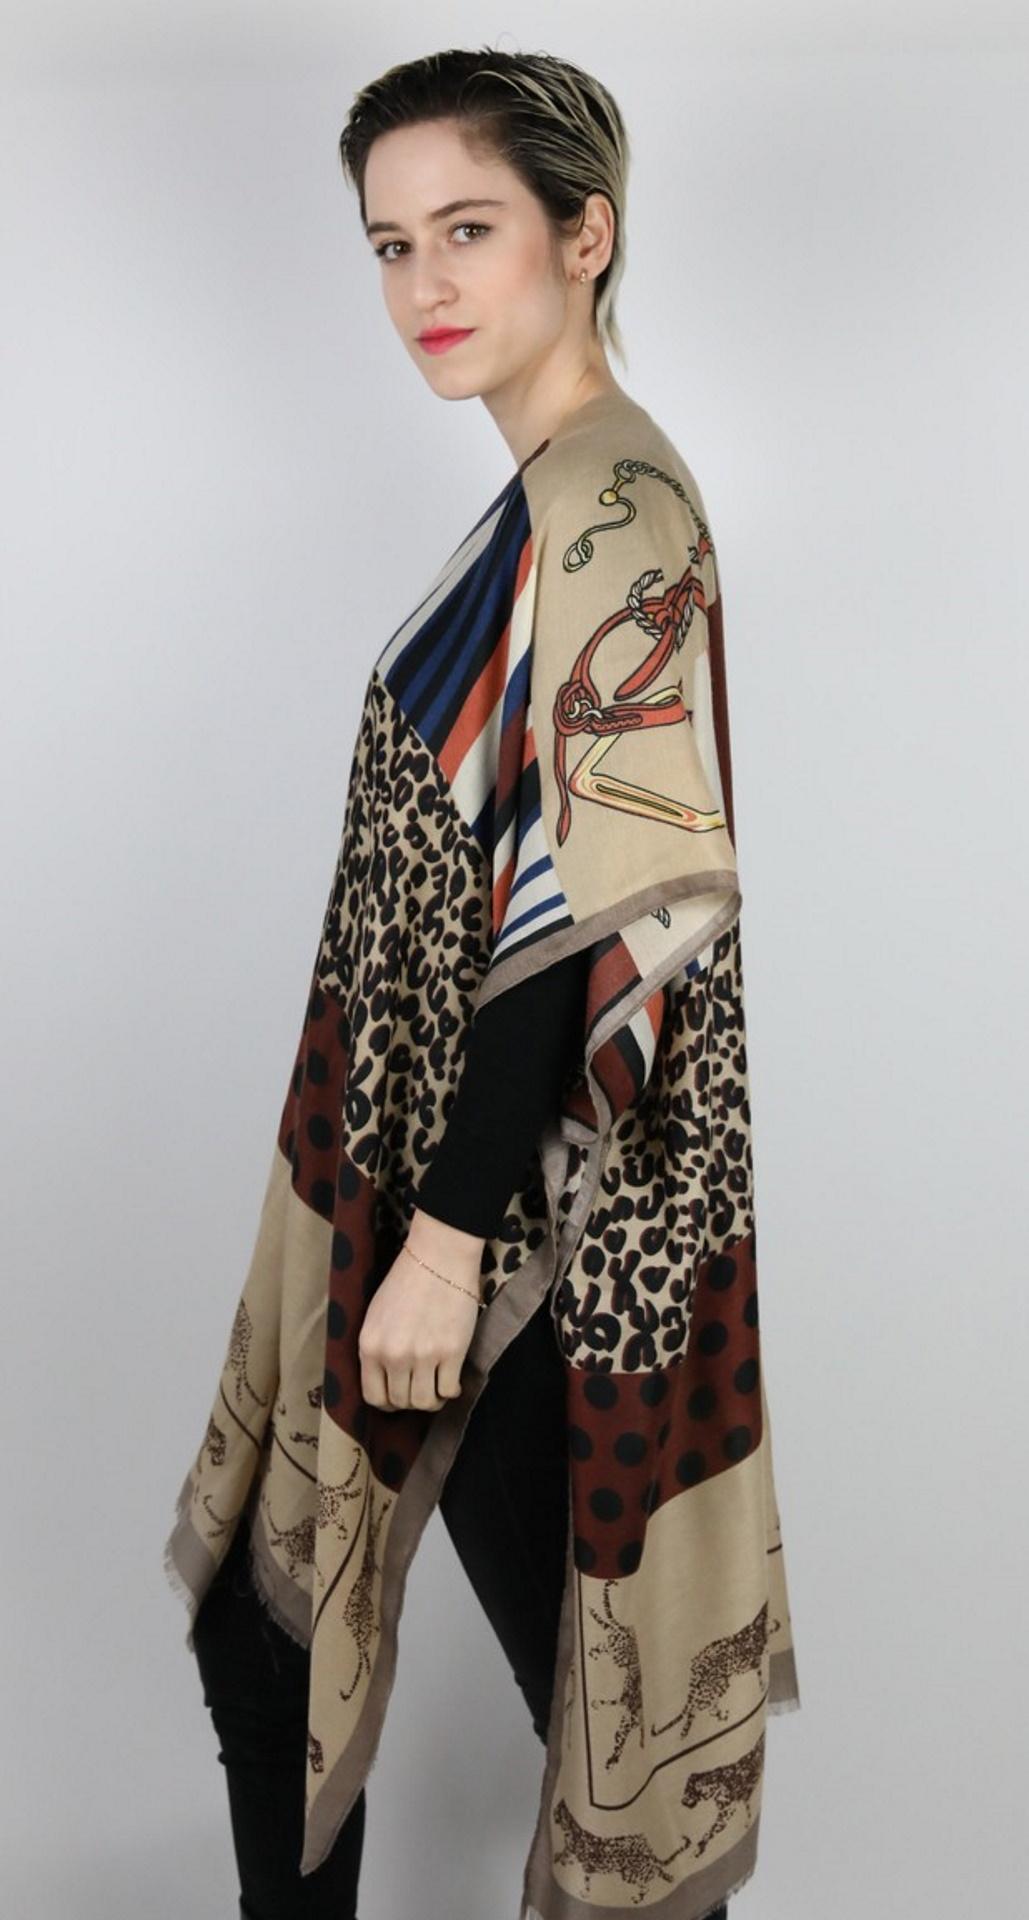 CLOTHES02 STOLA DONNA FOULARD CARDIGAN COPRISPALLE 2 1stAmerican elegante stola da donna foulard cardigan coprispalle